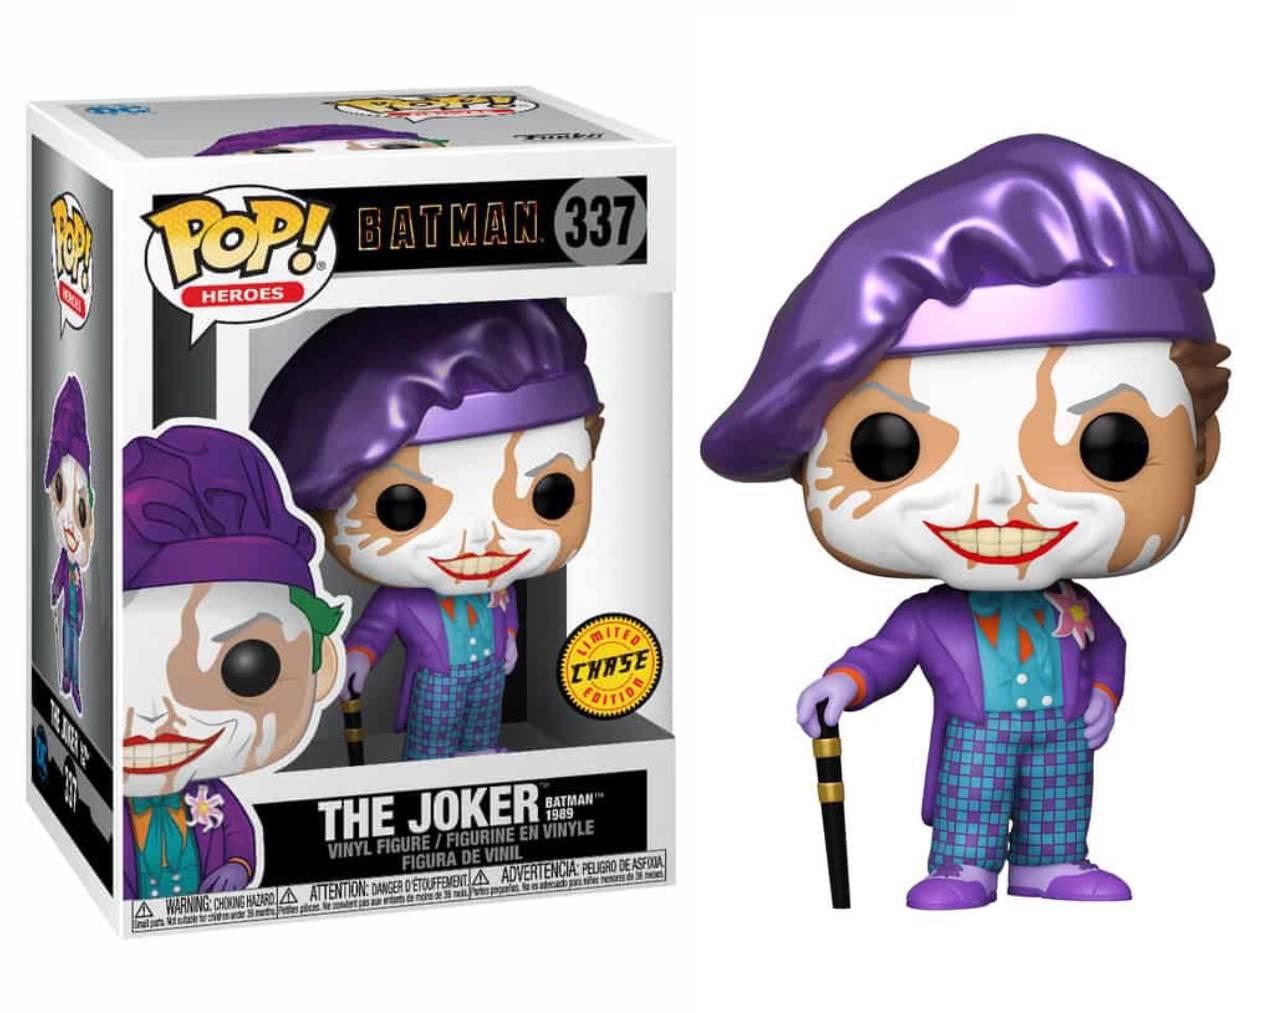 The Joker (Chase Edition) Pop! Vinyl